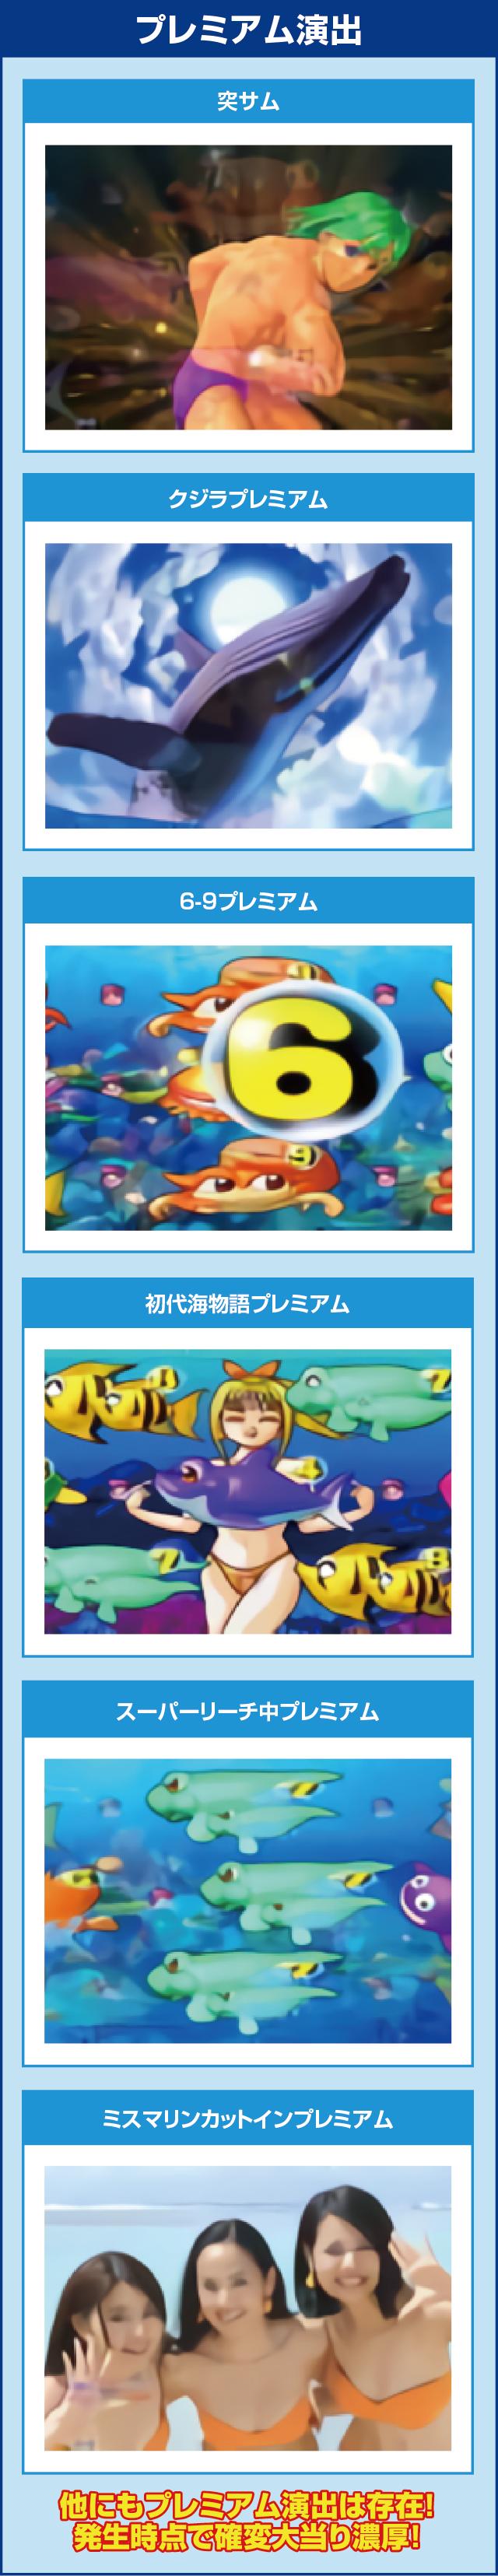 CRAスーパー海物語IN沖縄4withアイマリンのピックアップポイント